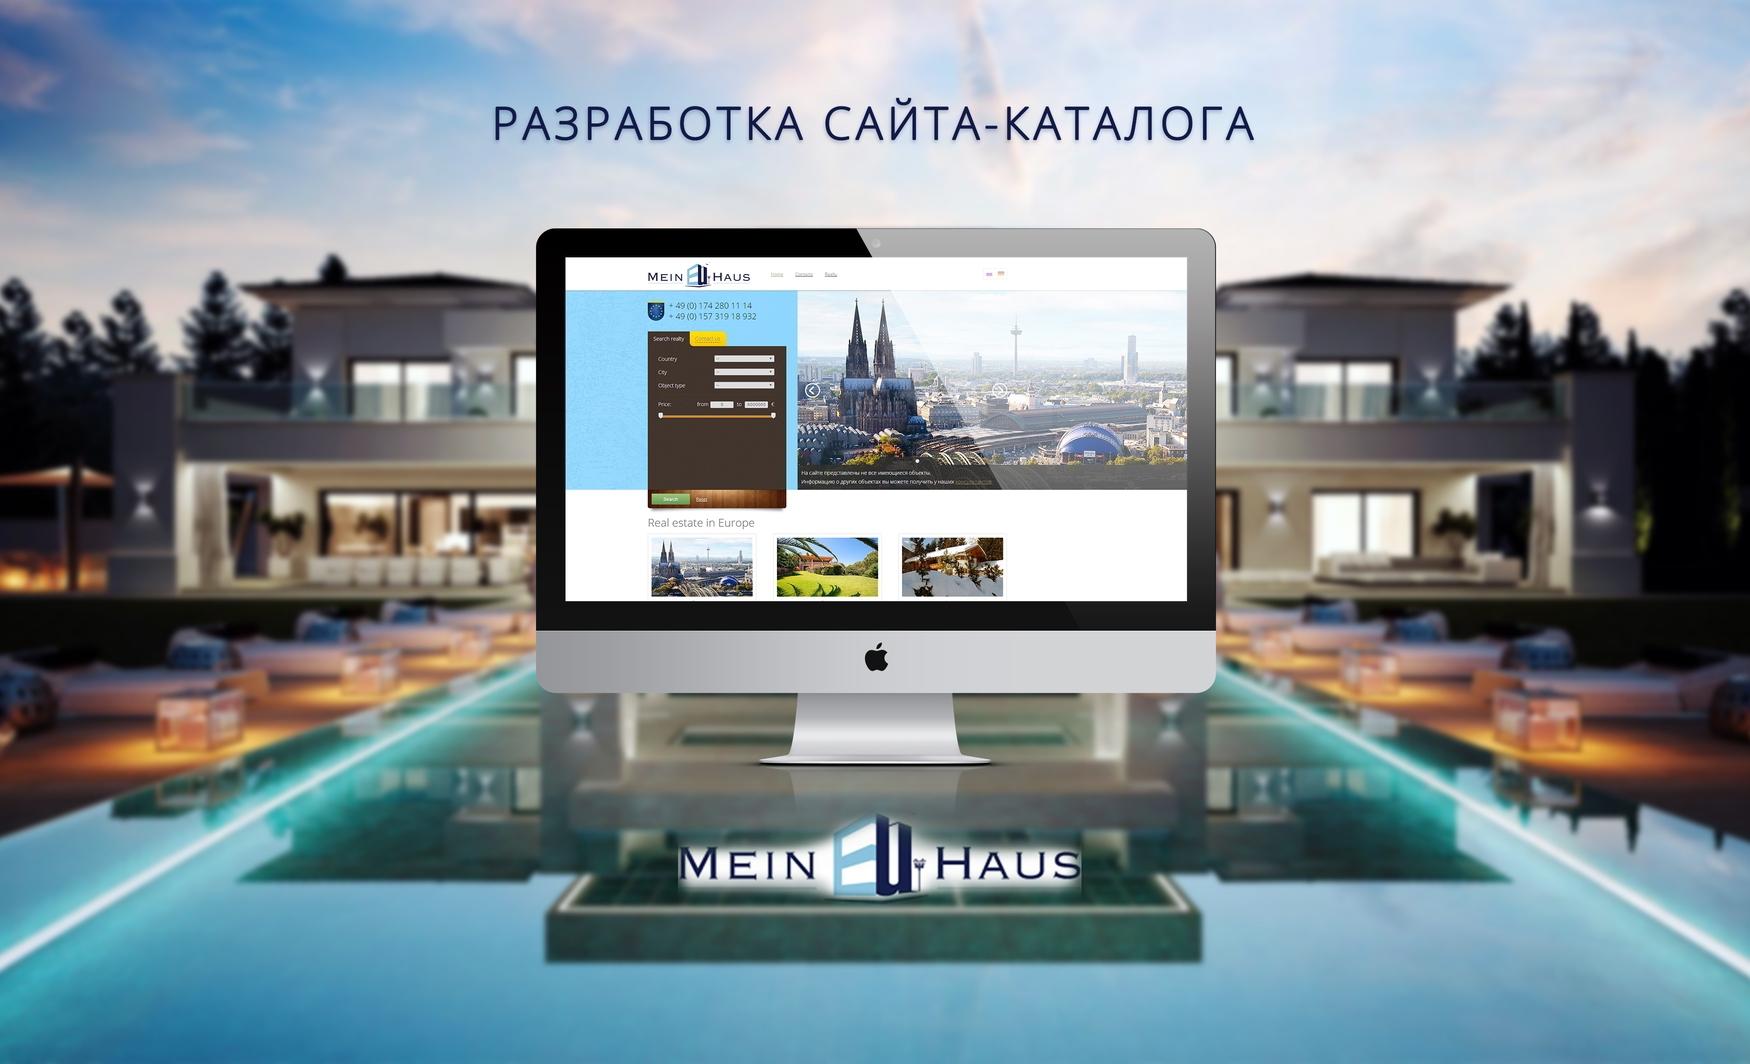 17150576bca6e Разработка сайта-каталога недвижимости для Mein Haus - веб-студия COWORK